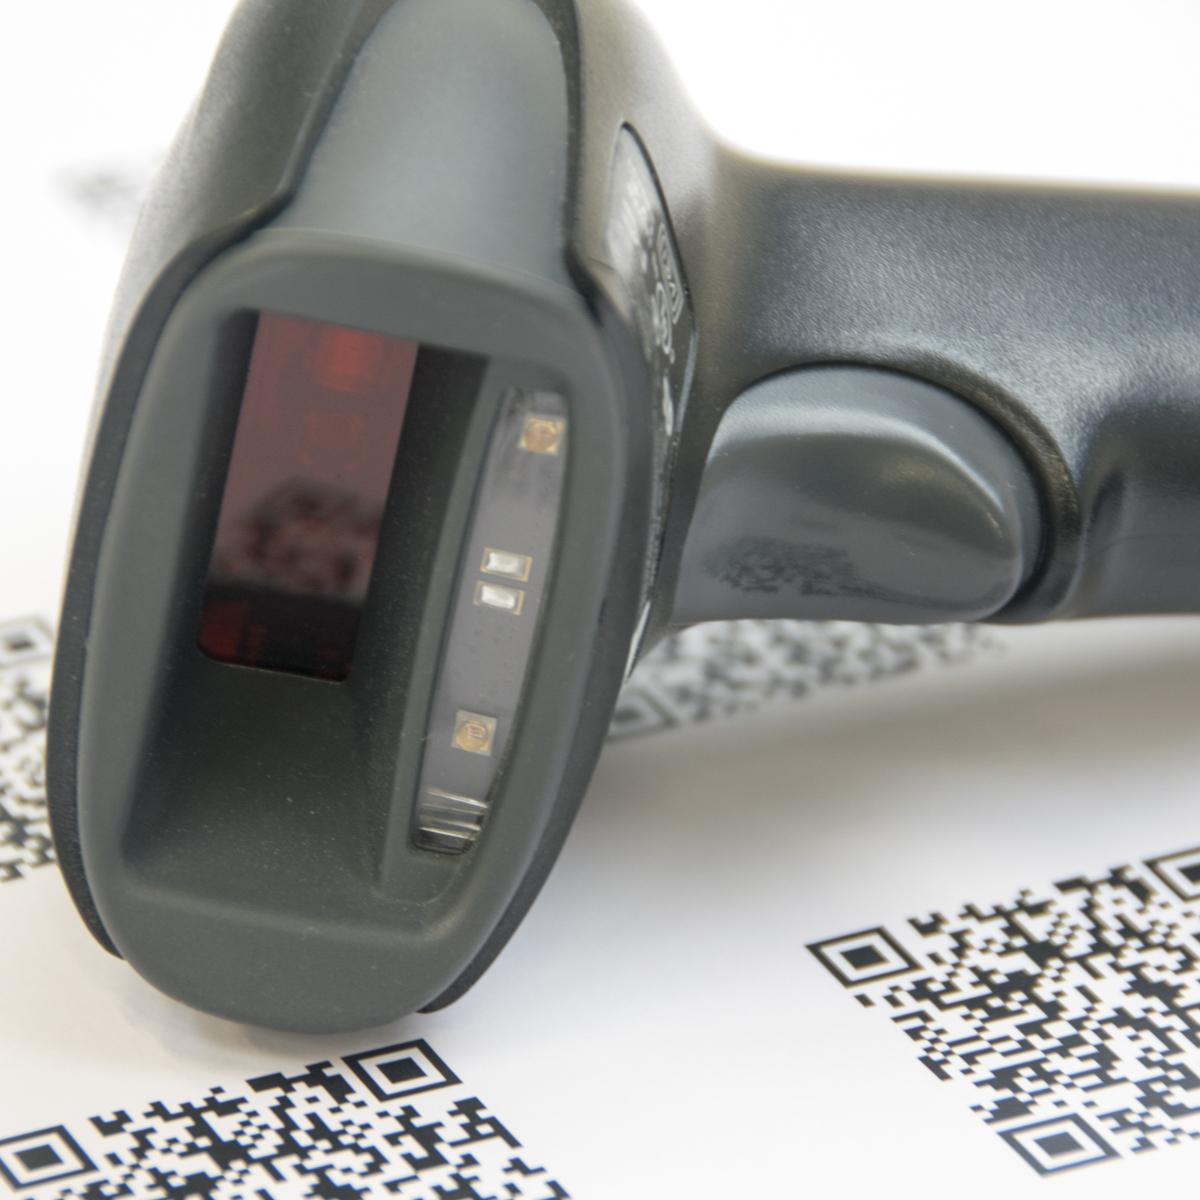 scanner MIRA Software